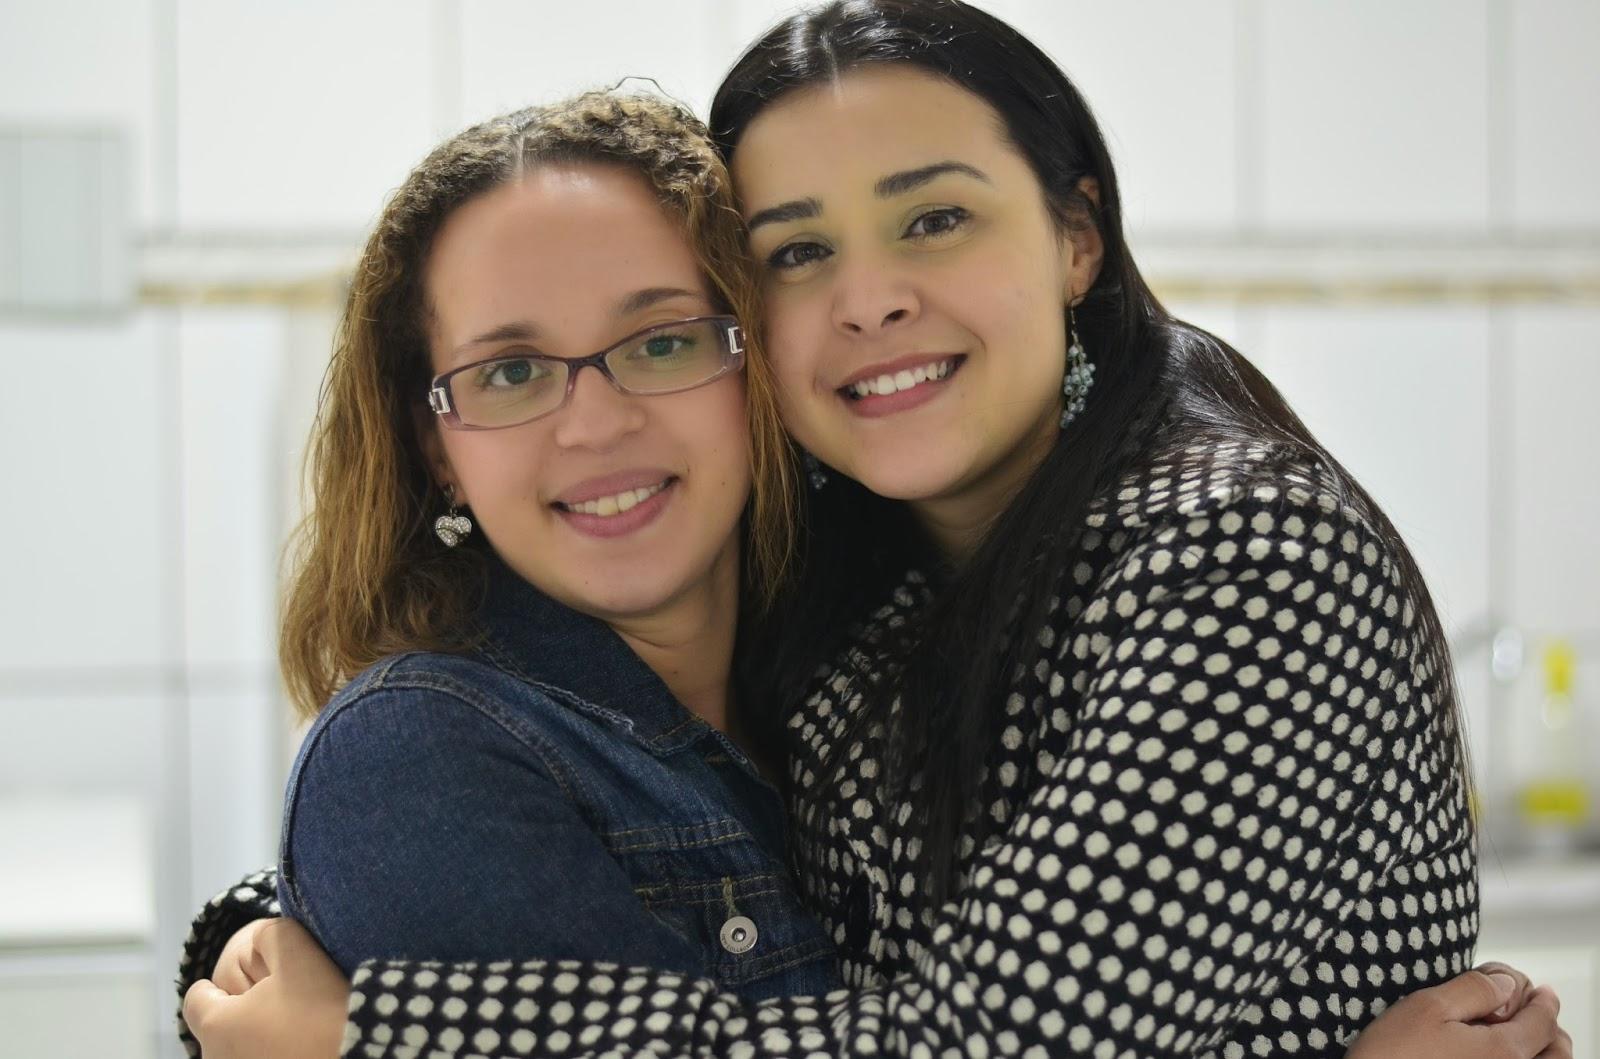 Eliane Sopran_ Viver, Amar, Fazer Valer a Pena!!! Mãe de UTI